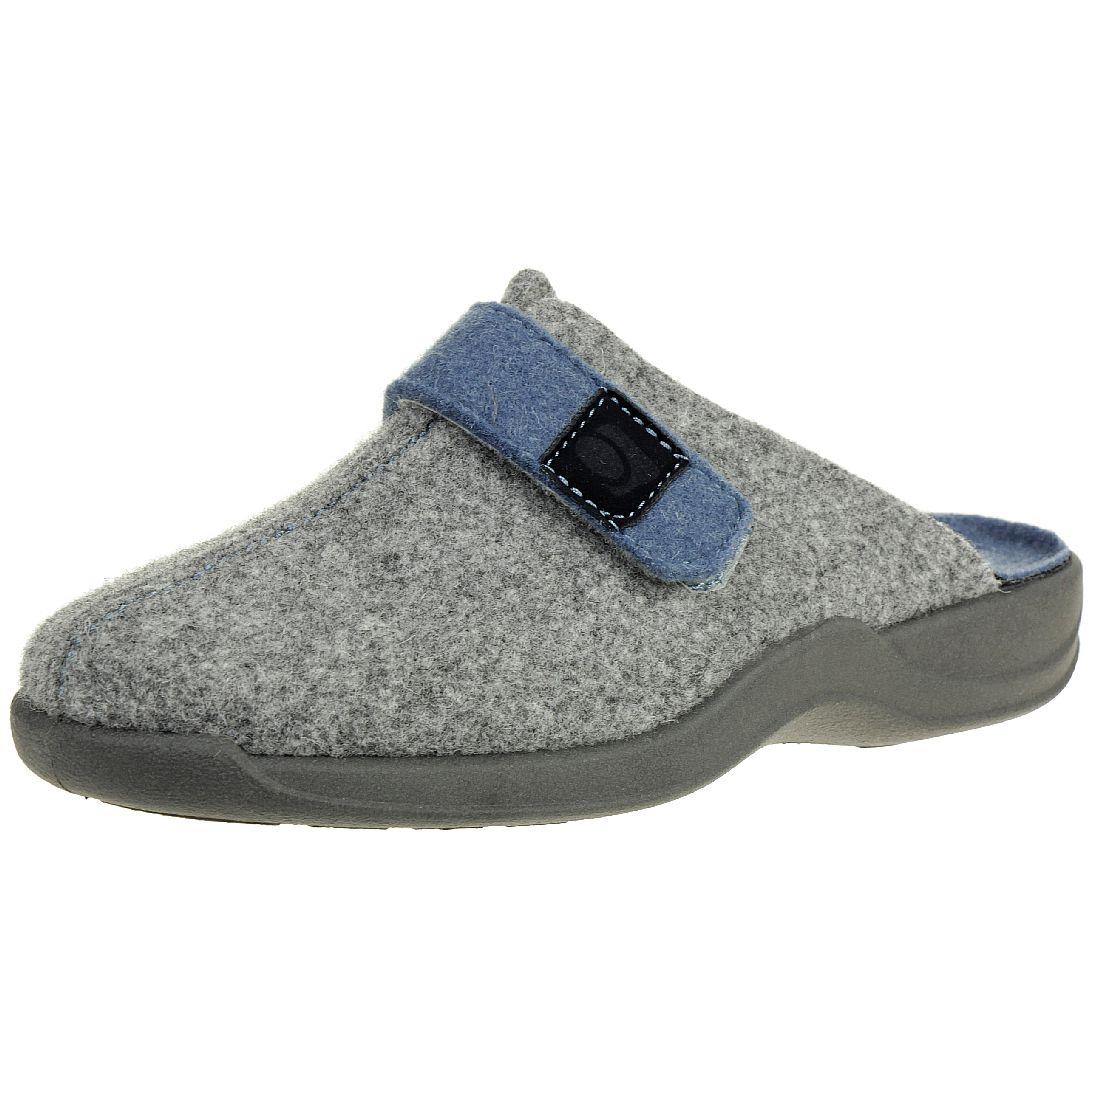 Farben und auffällig Kauf echt attraktiver Preis Rohde Vaasa Clogs Damen Hausschuhe Pantolette grau Filz 2315 ...